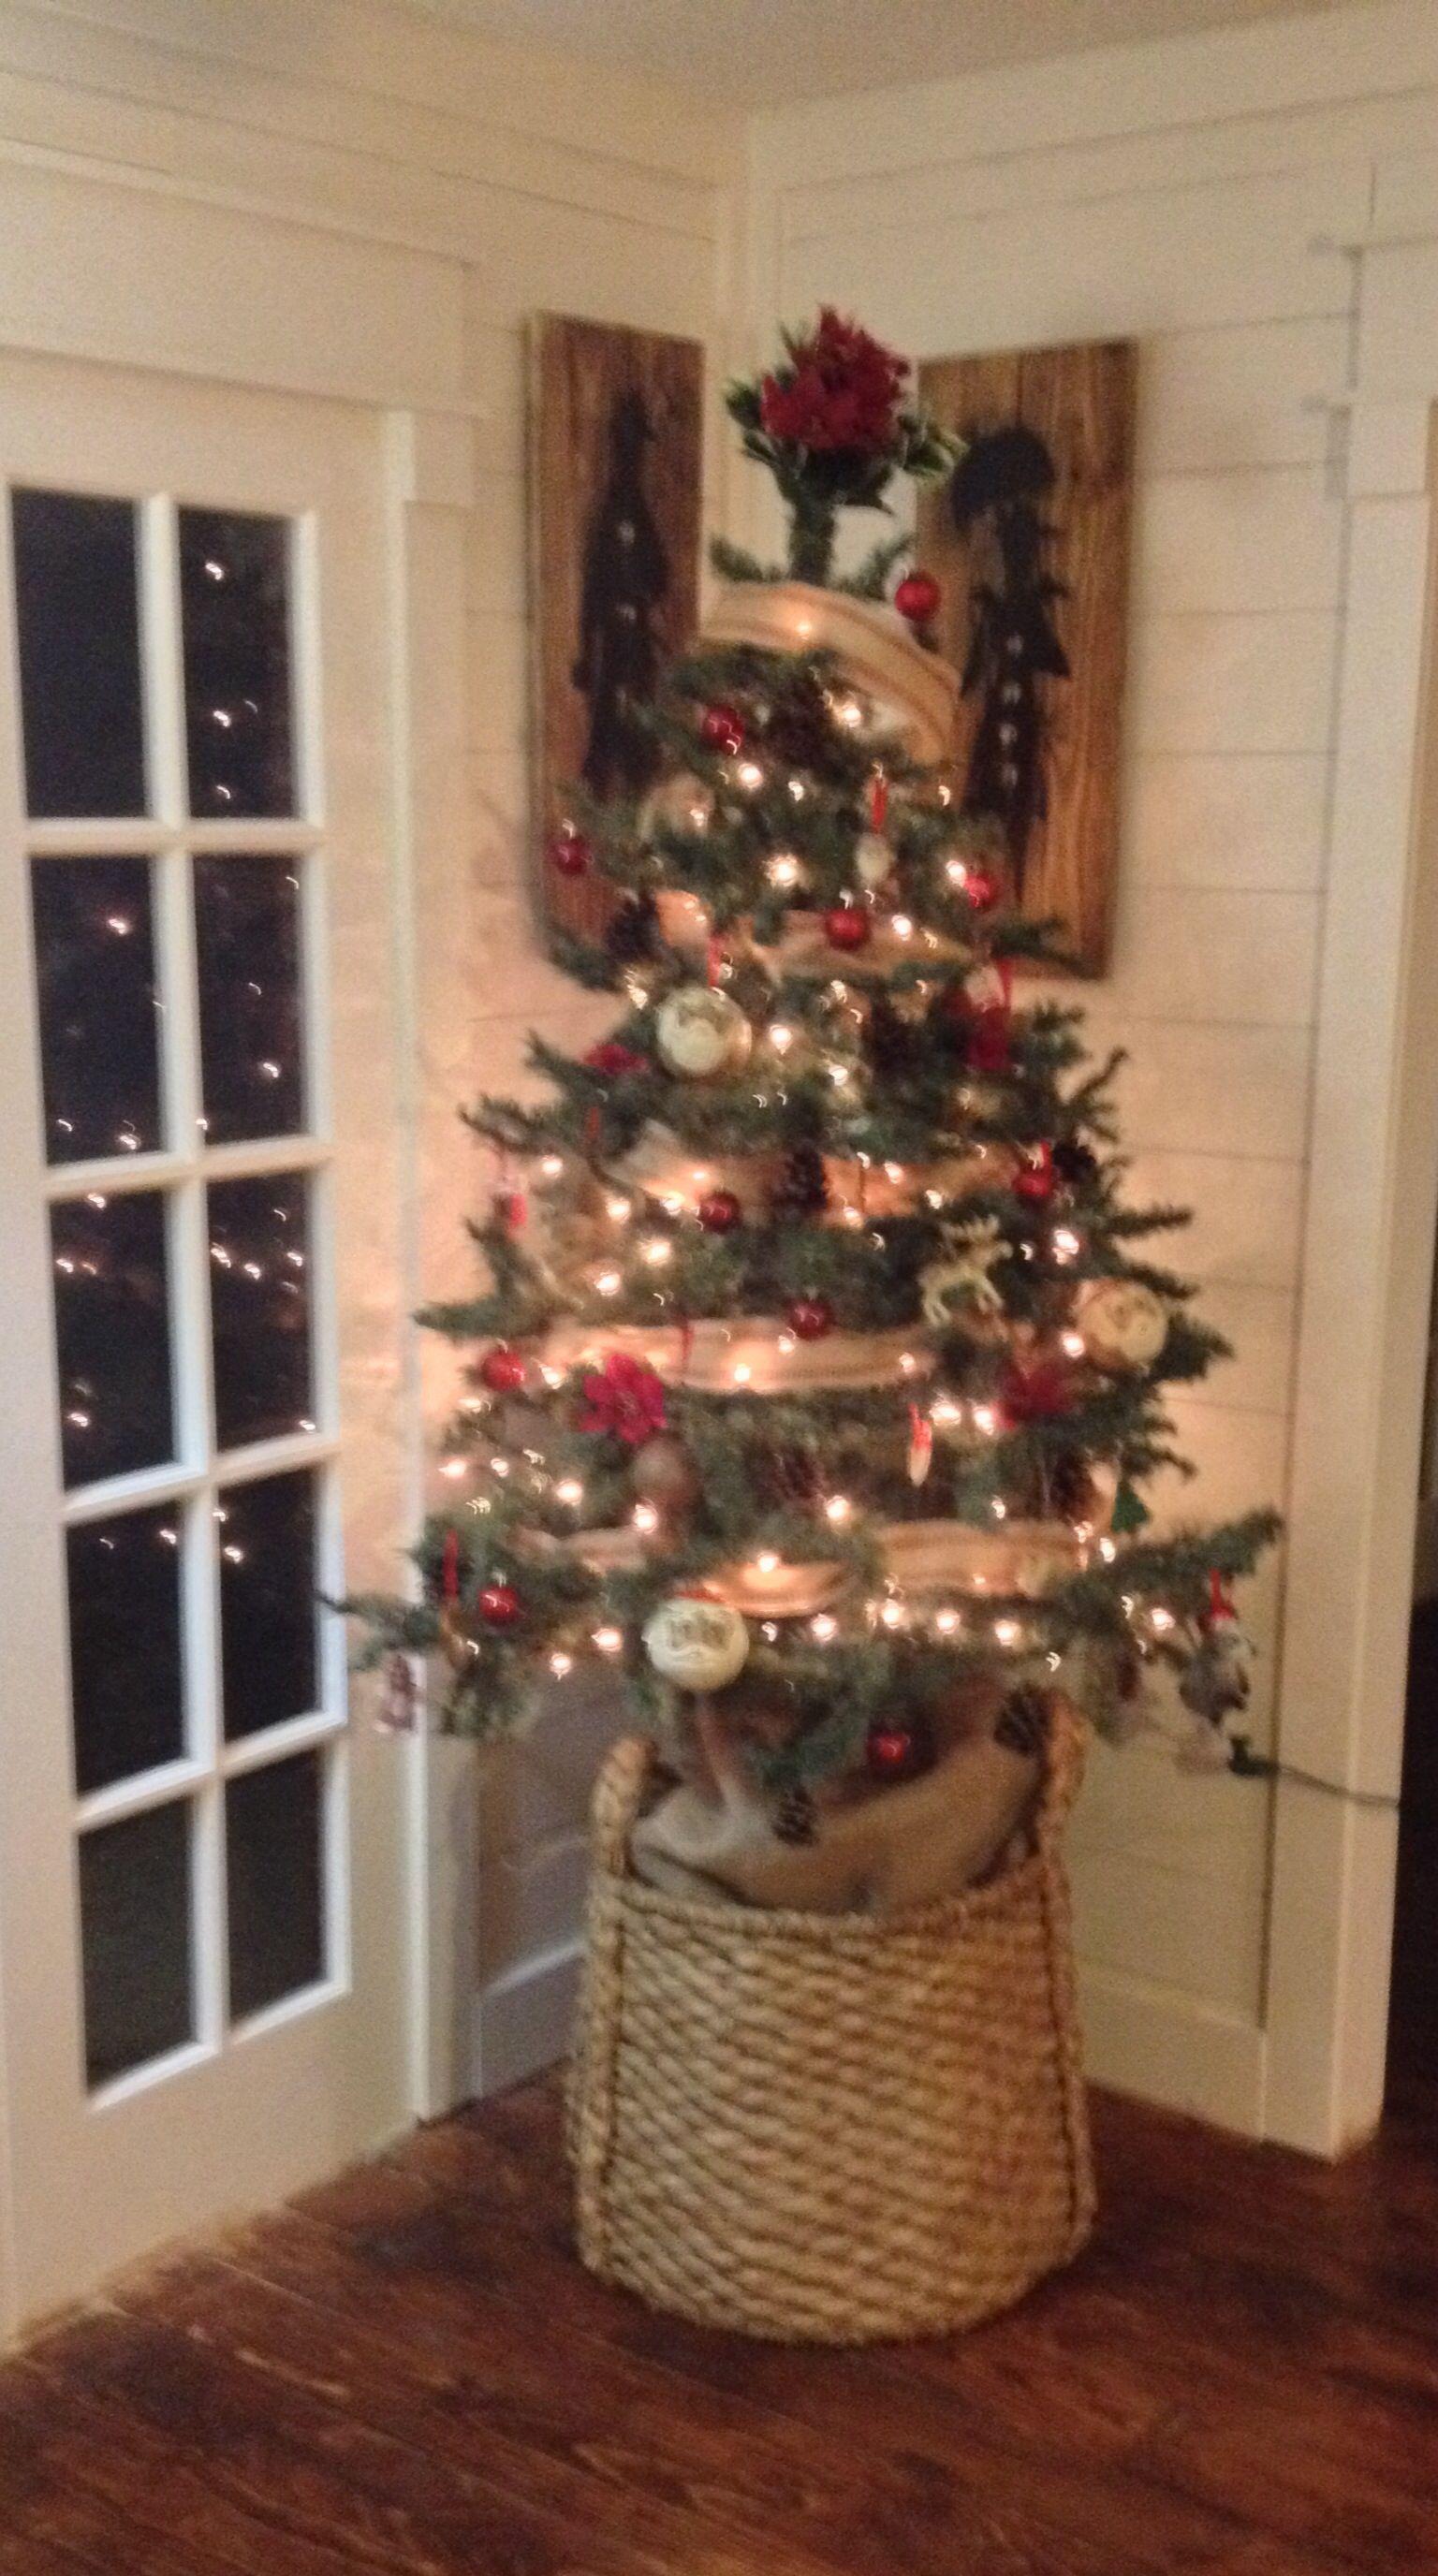 Christmas Tree Riser Christmas Tree Holiday Decor Home Crafts